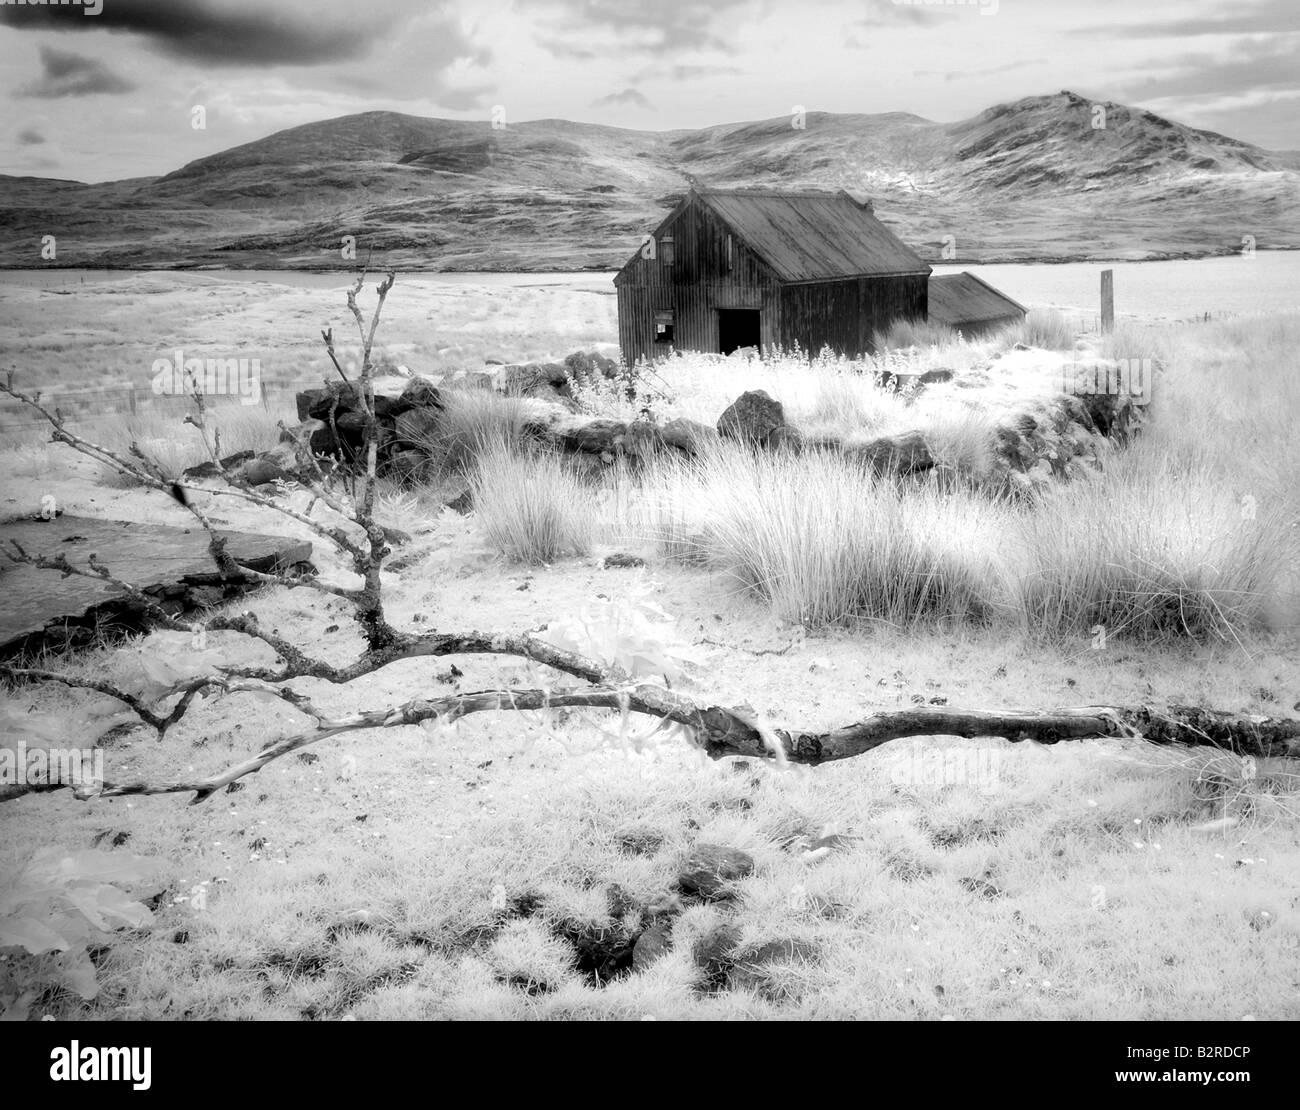 Infrared image of a derelict hut near Arivruach, Isle of Lewis, Hebrides, Scotland, UK Stock Photo